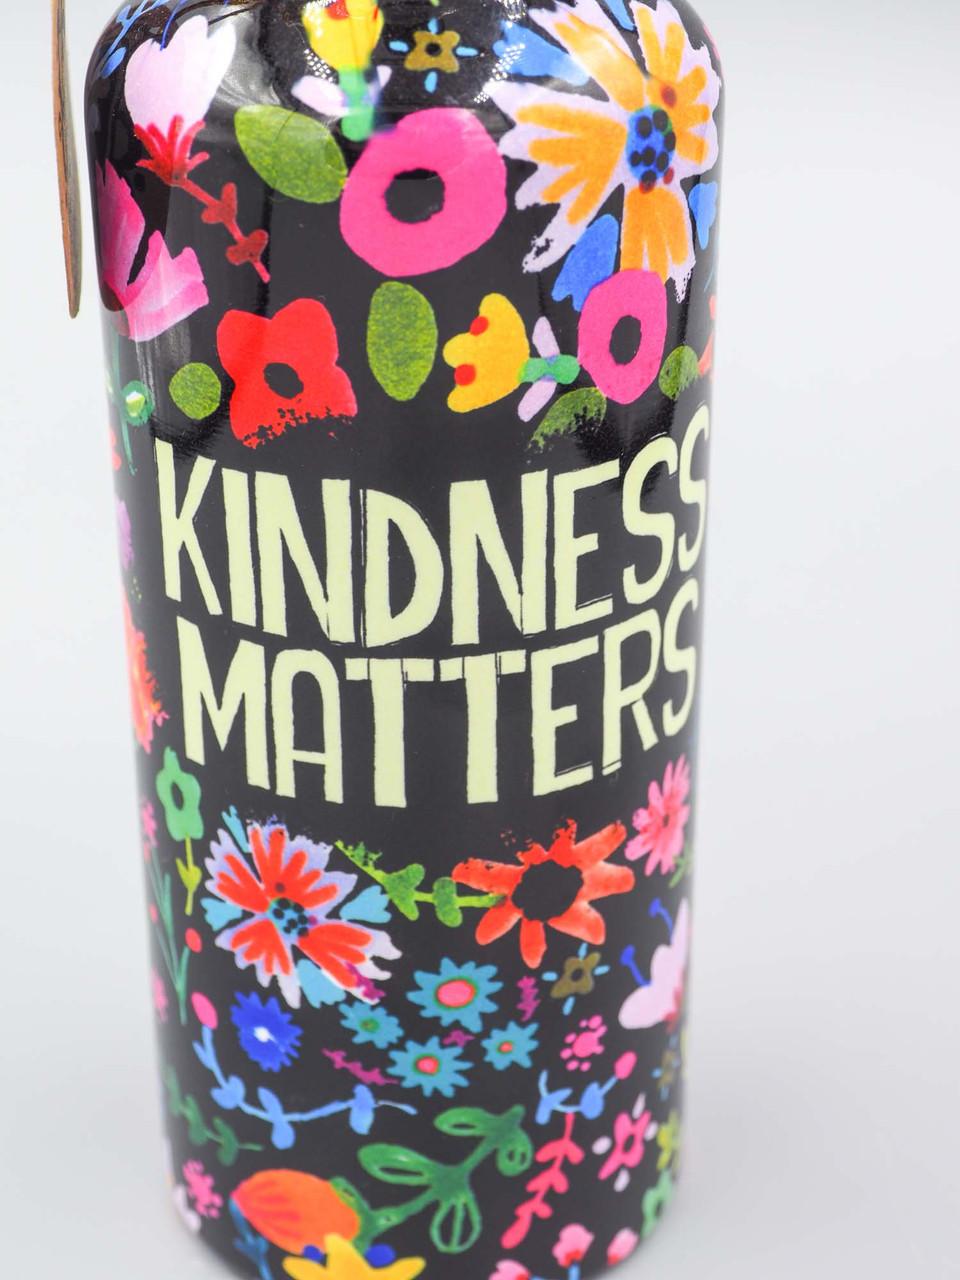 kindness matters traveler water bottle natural life